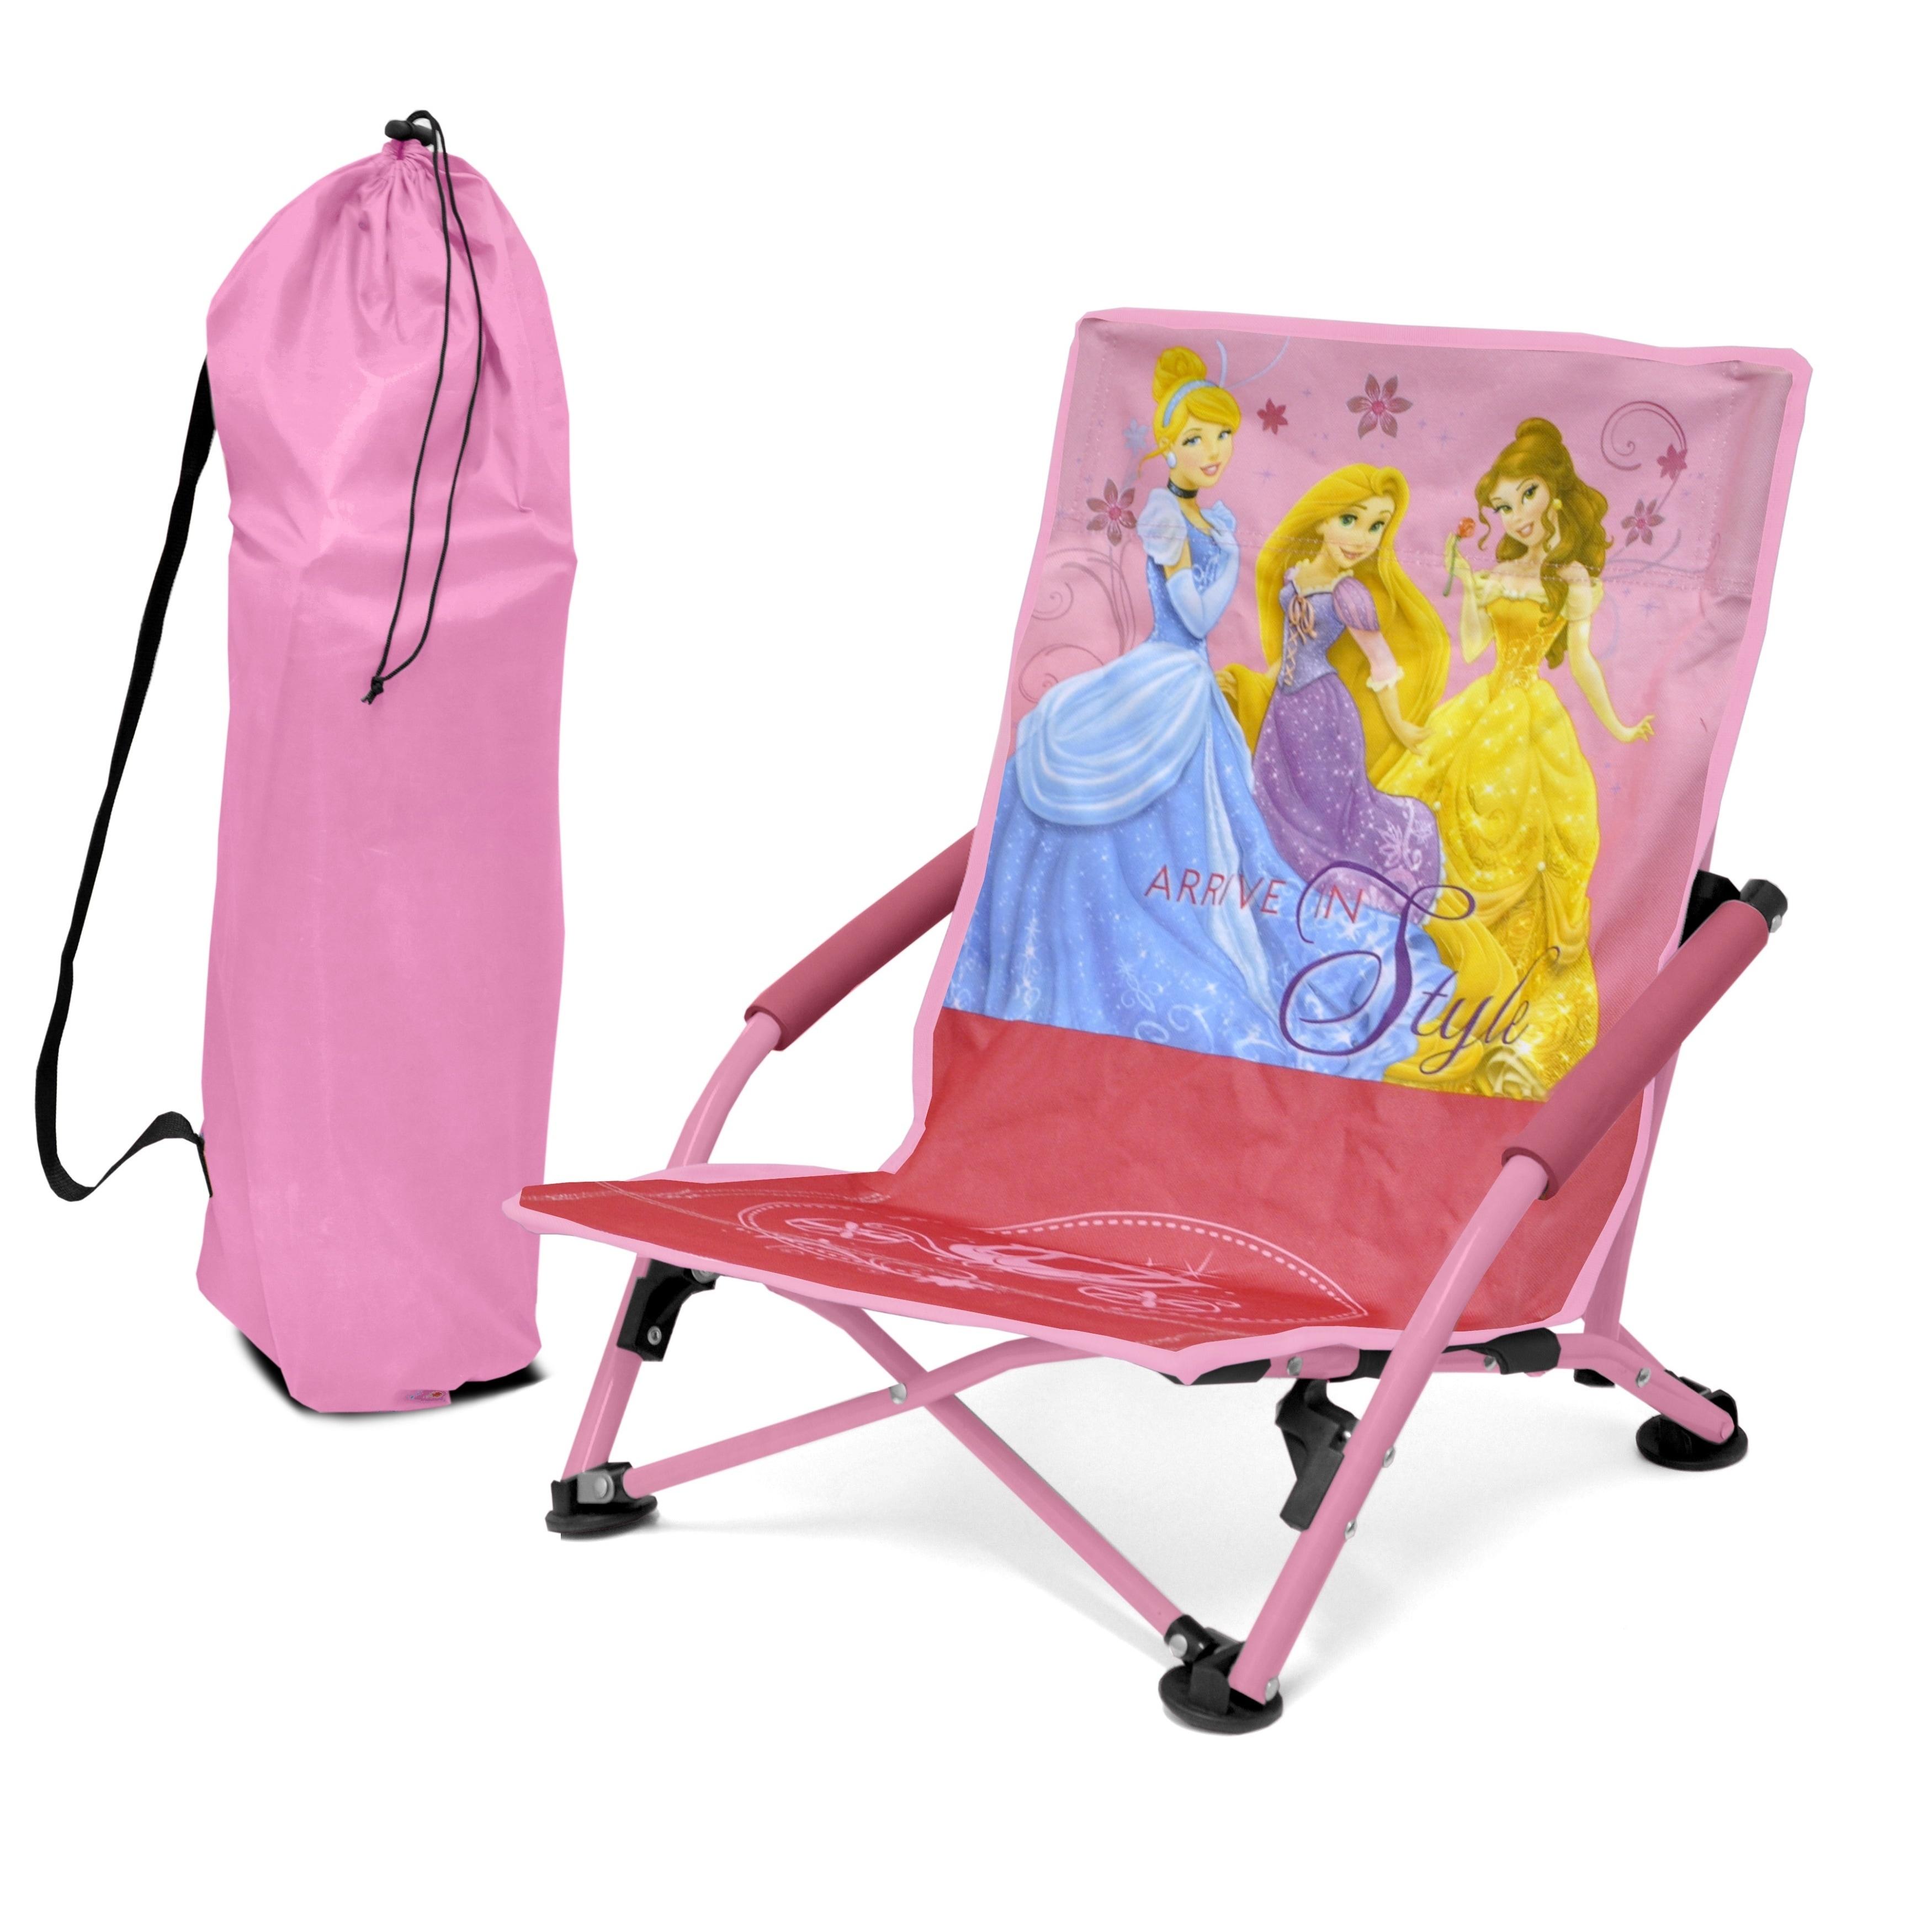 Disney Princess Kids Folding Lounge Chair (Princess), Blu...